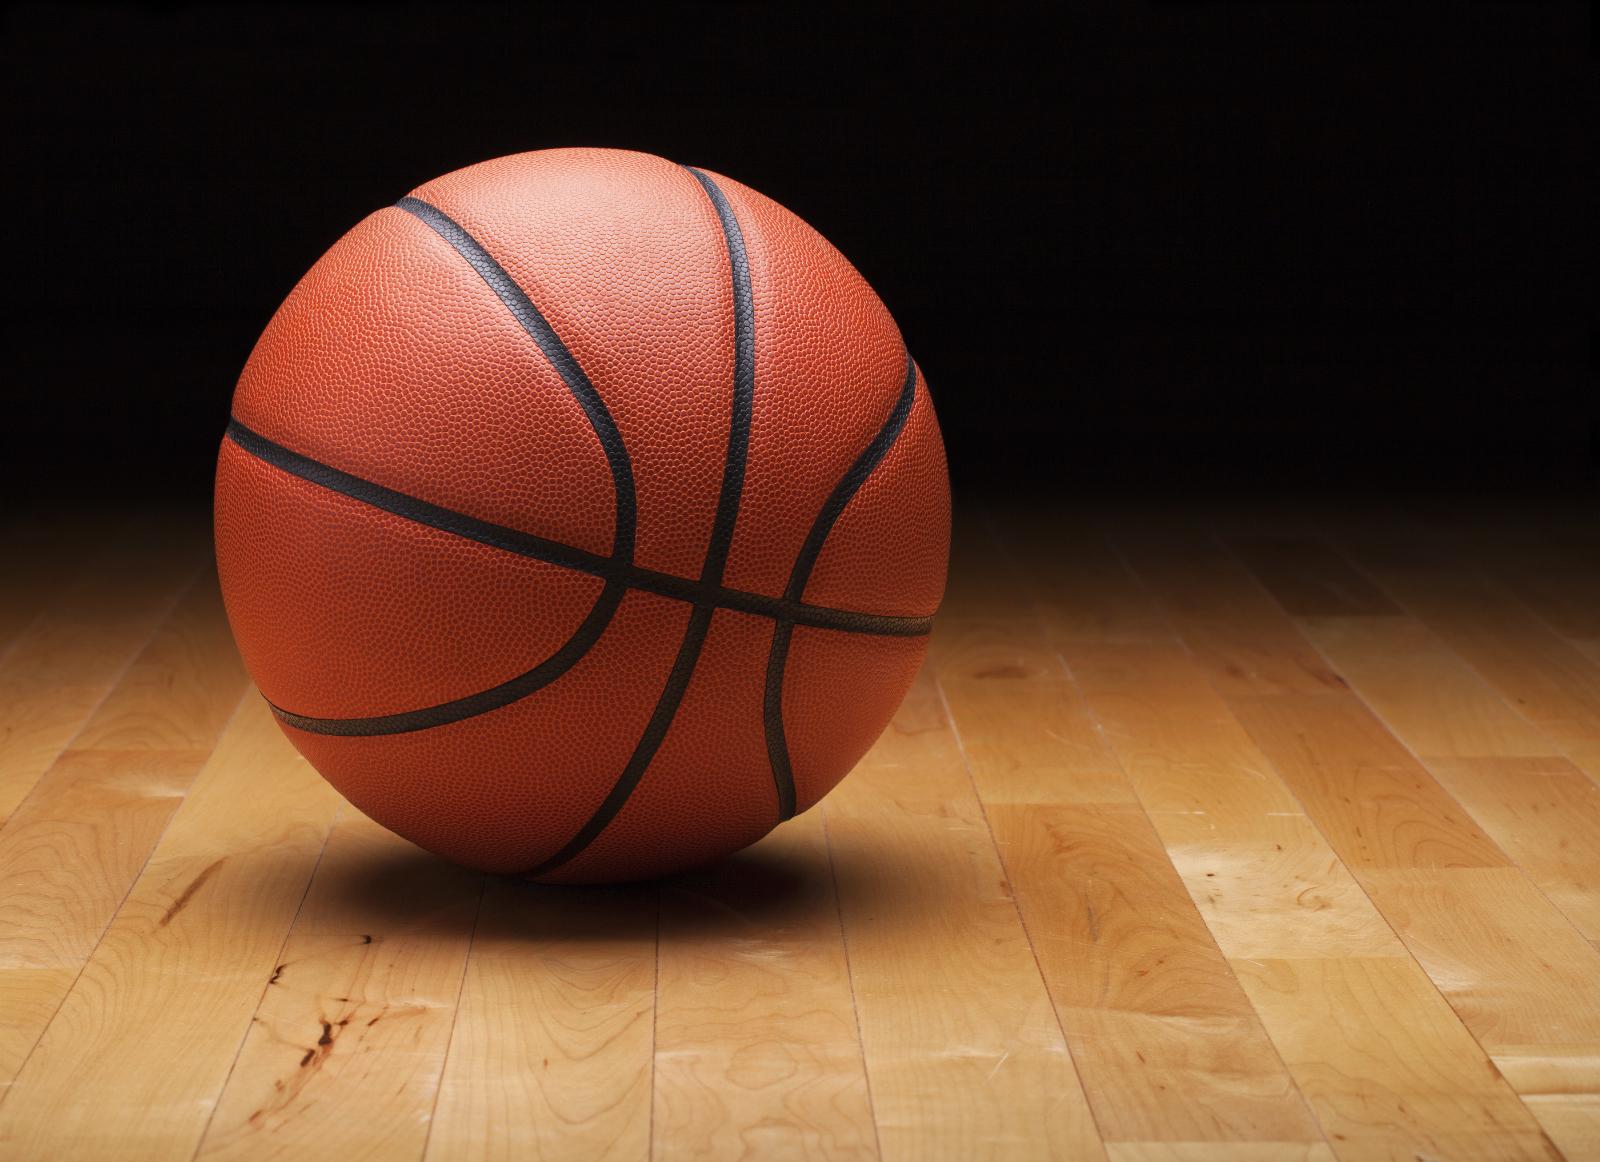 2019-20 NPHS Girls Basketball Tryouts